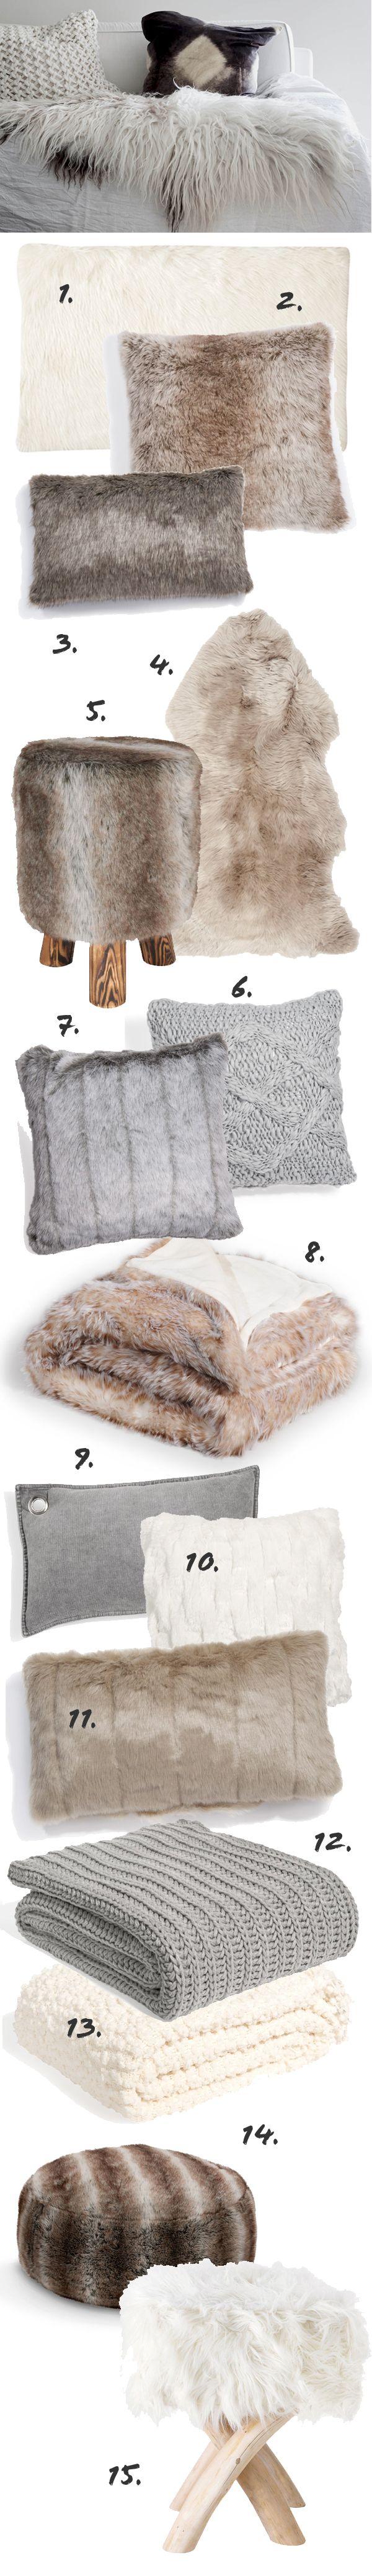 Top picture icelandic sheepskin.